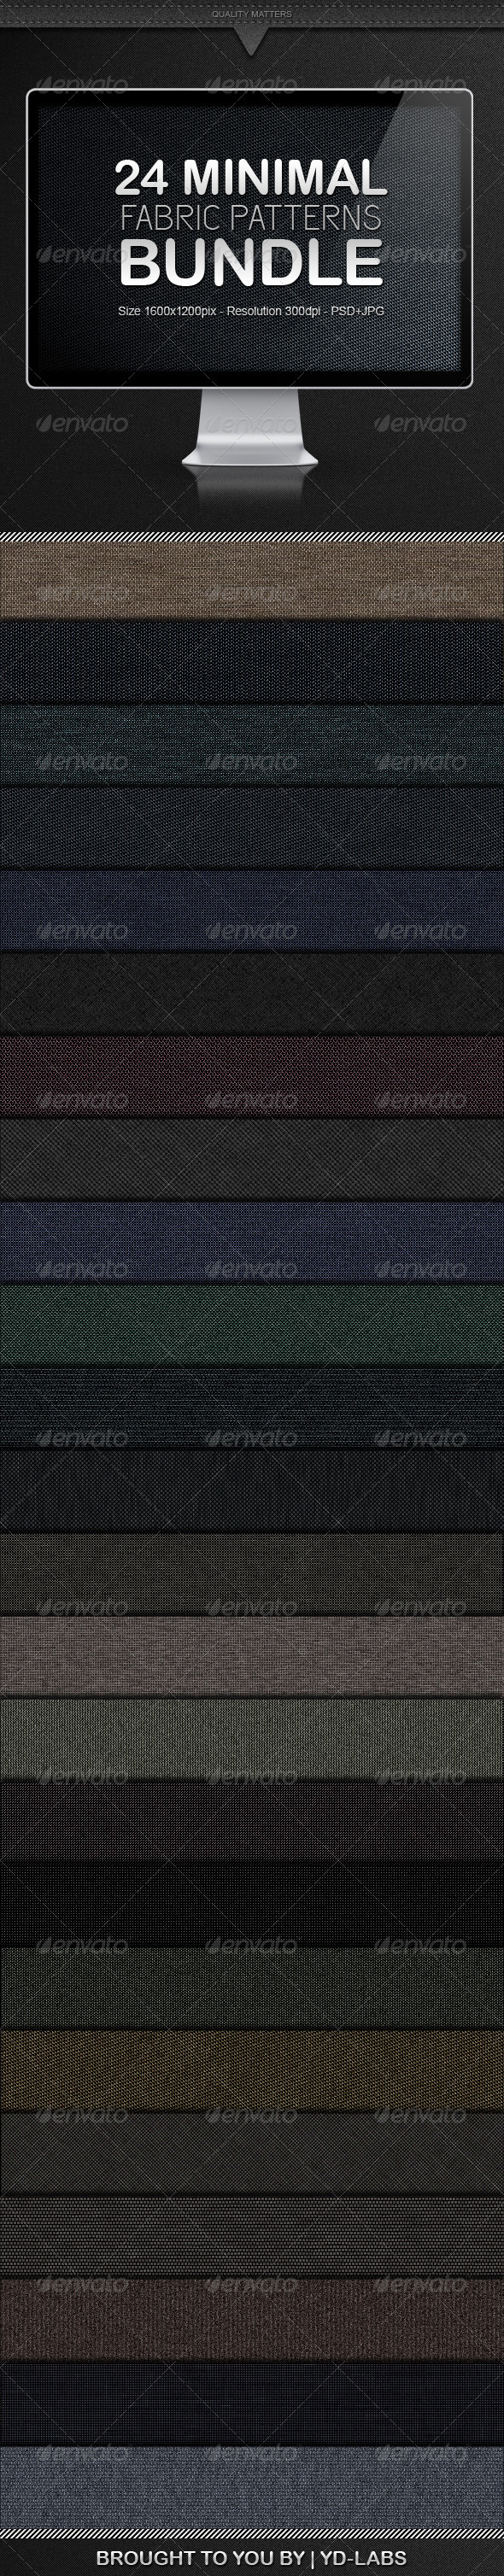 GraphicRiver 24 Minimal Fabric Patterns Bundle 1127241